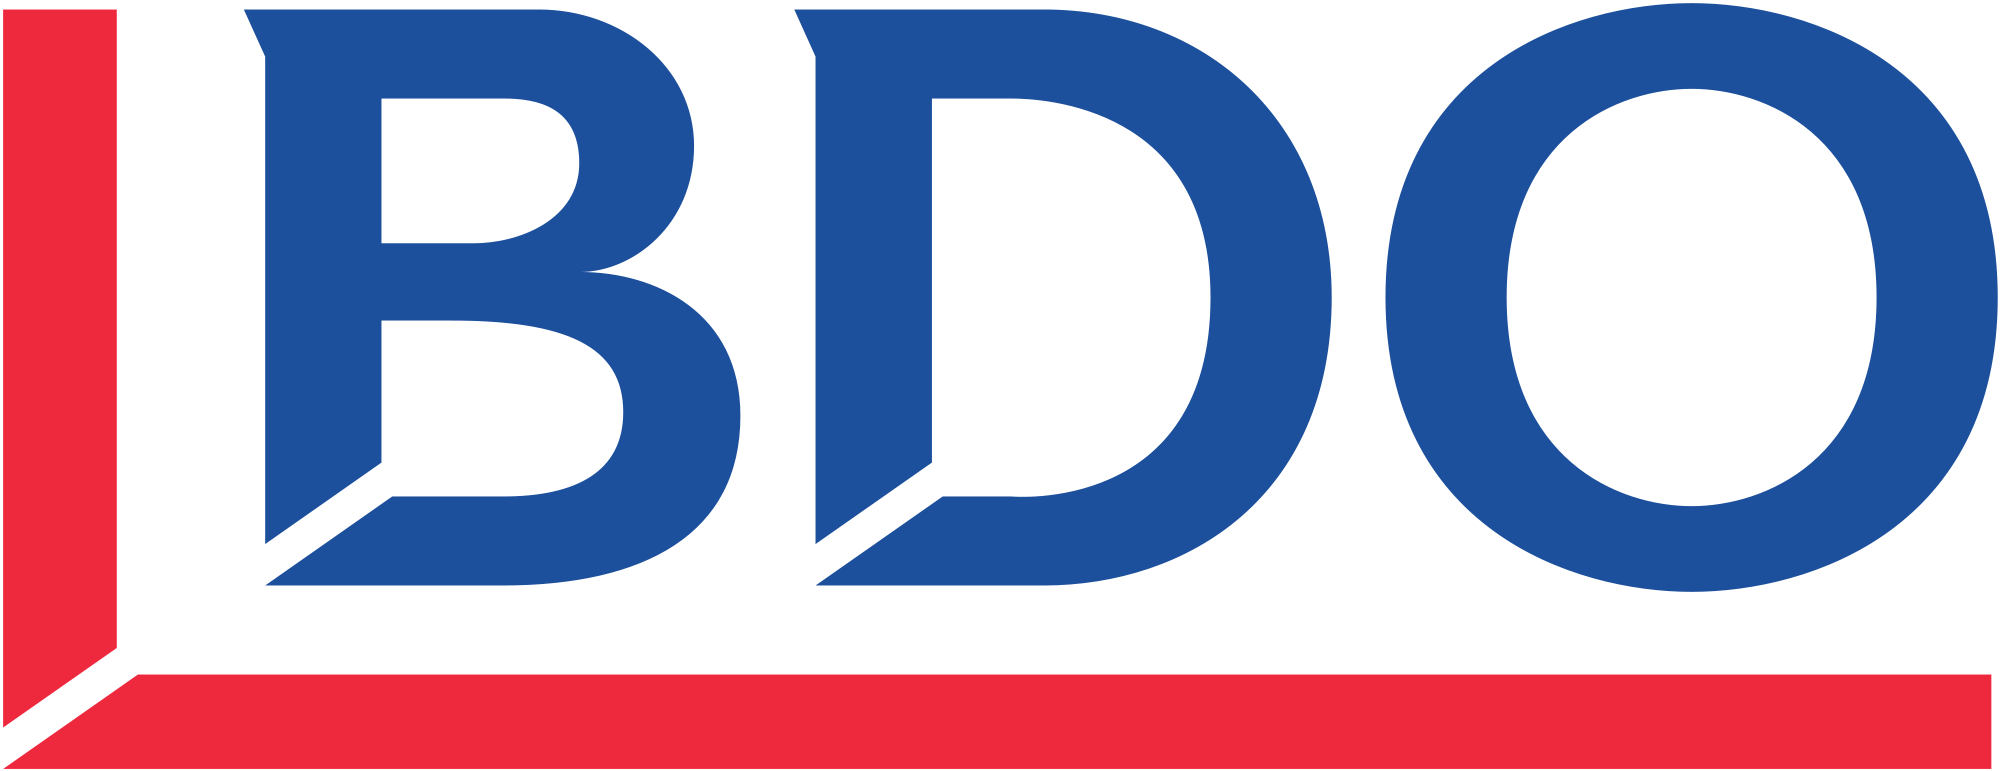 2000px-BDO_Deutsche_Warentreuhand_Logo_svg.png